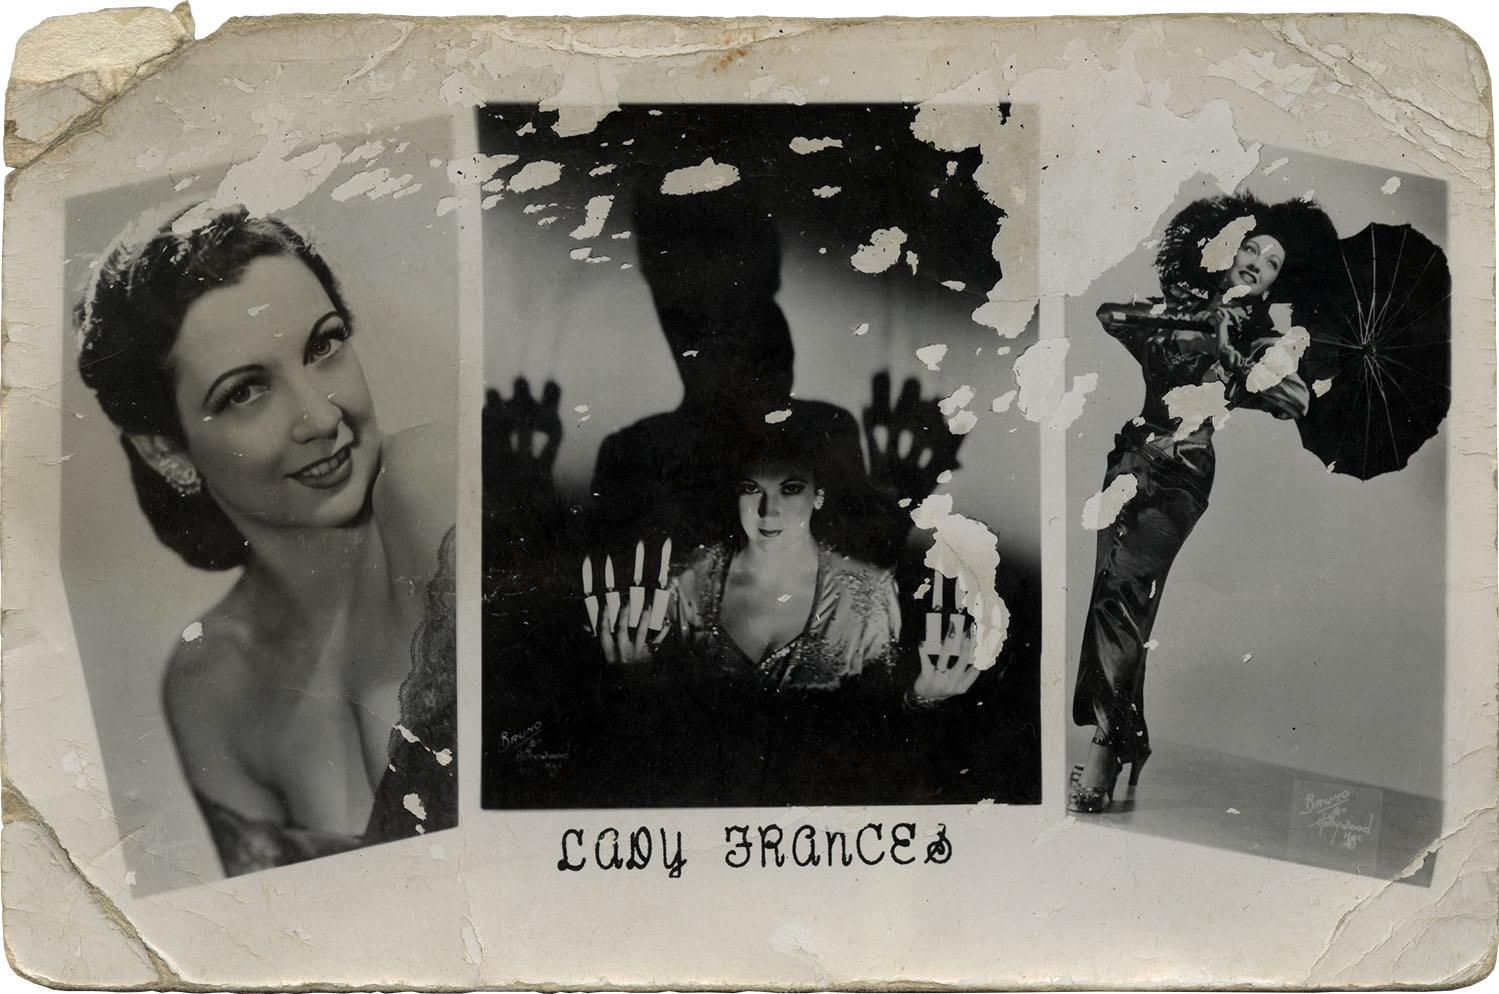 Lady Francis    photochrome promotional postcard, c. 1940s